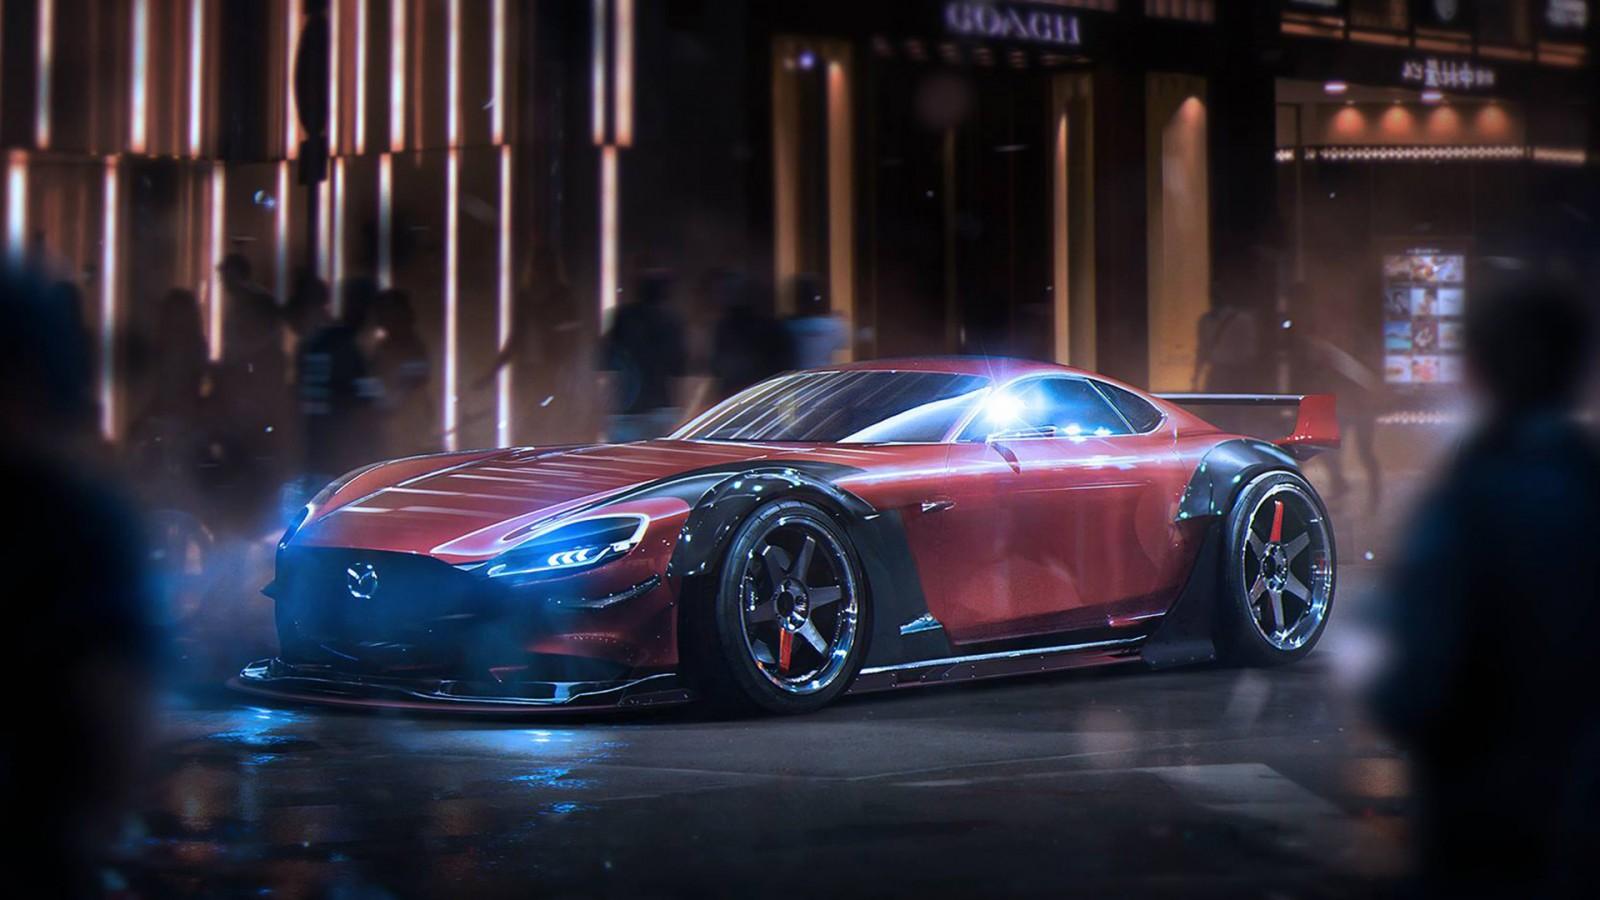 Car Wallpapers Hd 2015 Download Mazda Rx Vision Concept Wallpaper Hd Car Wallpapers Id